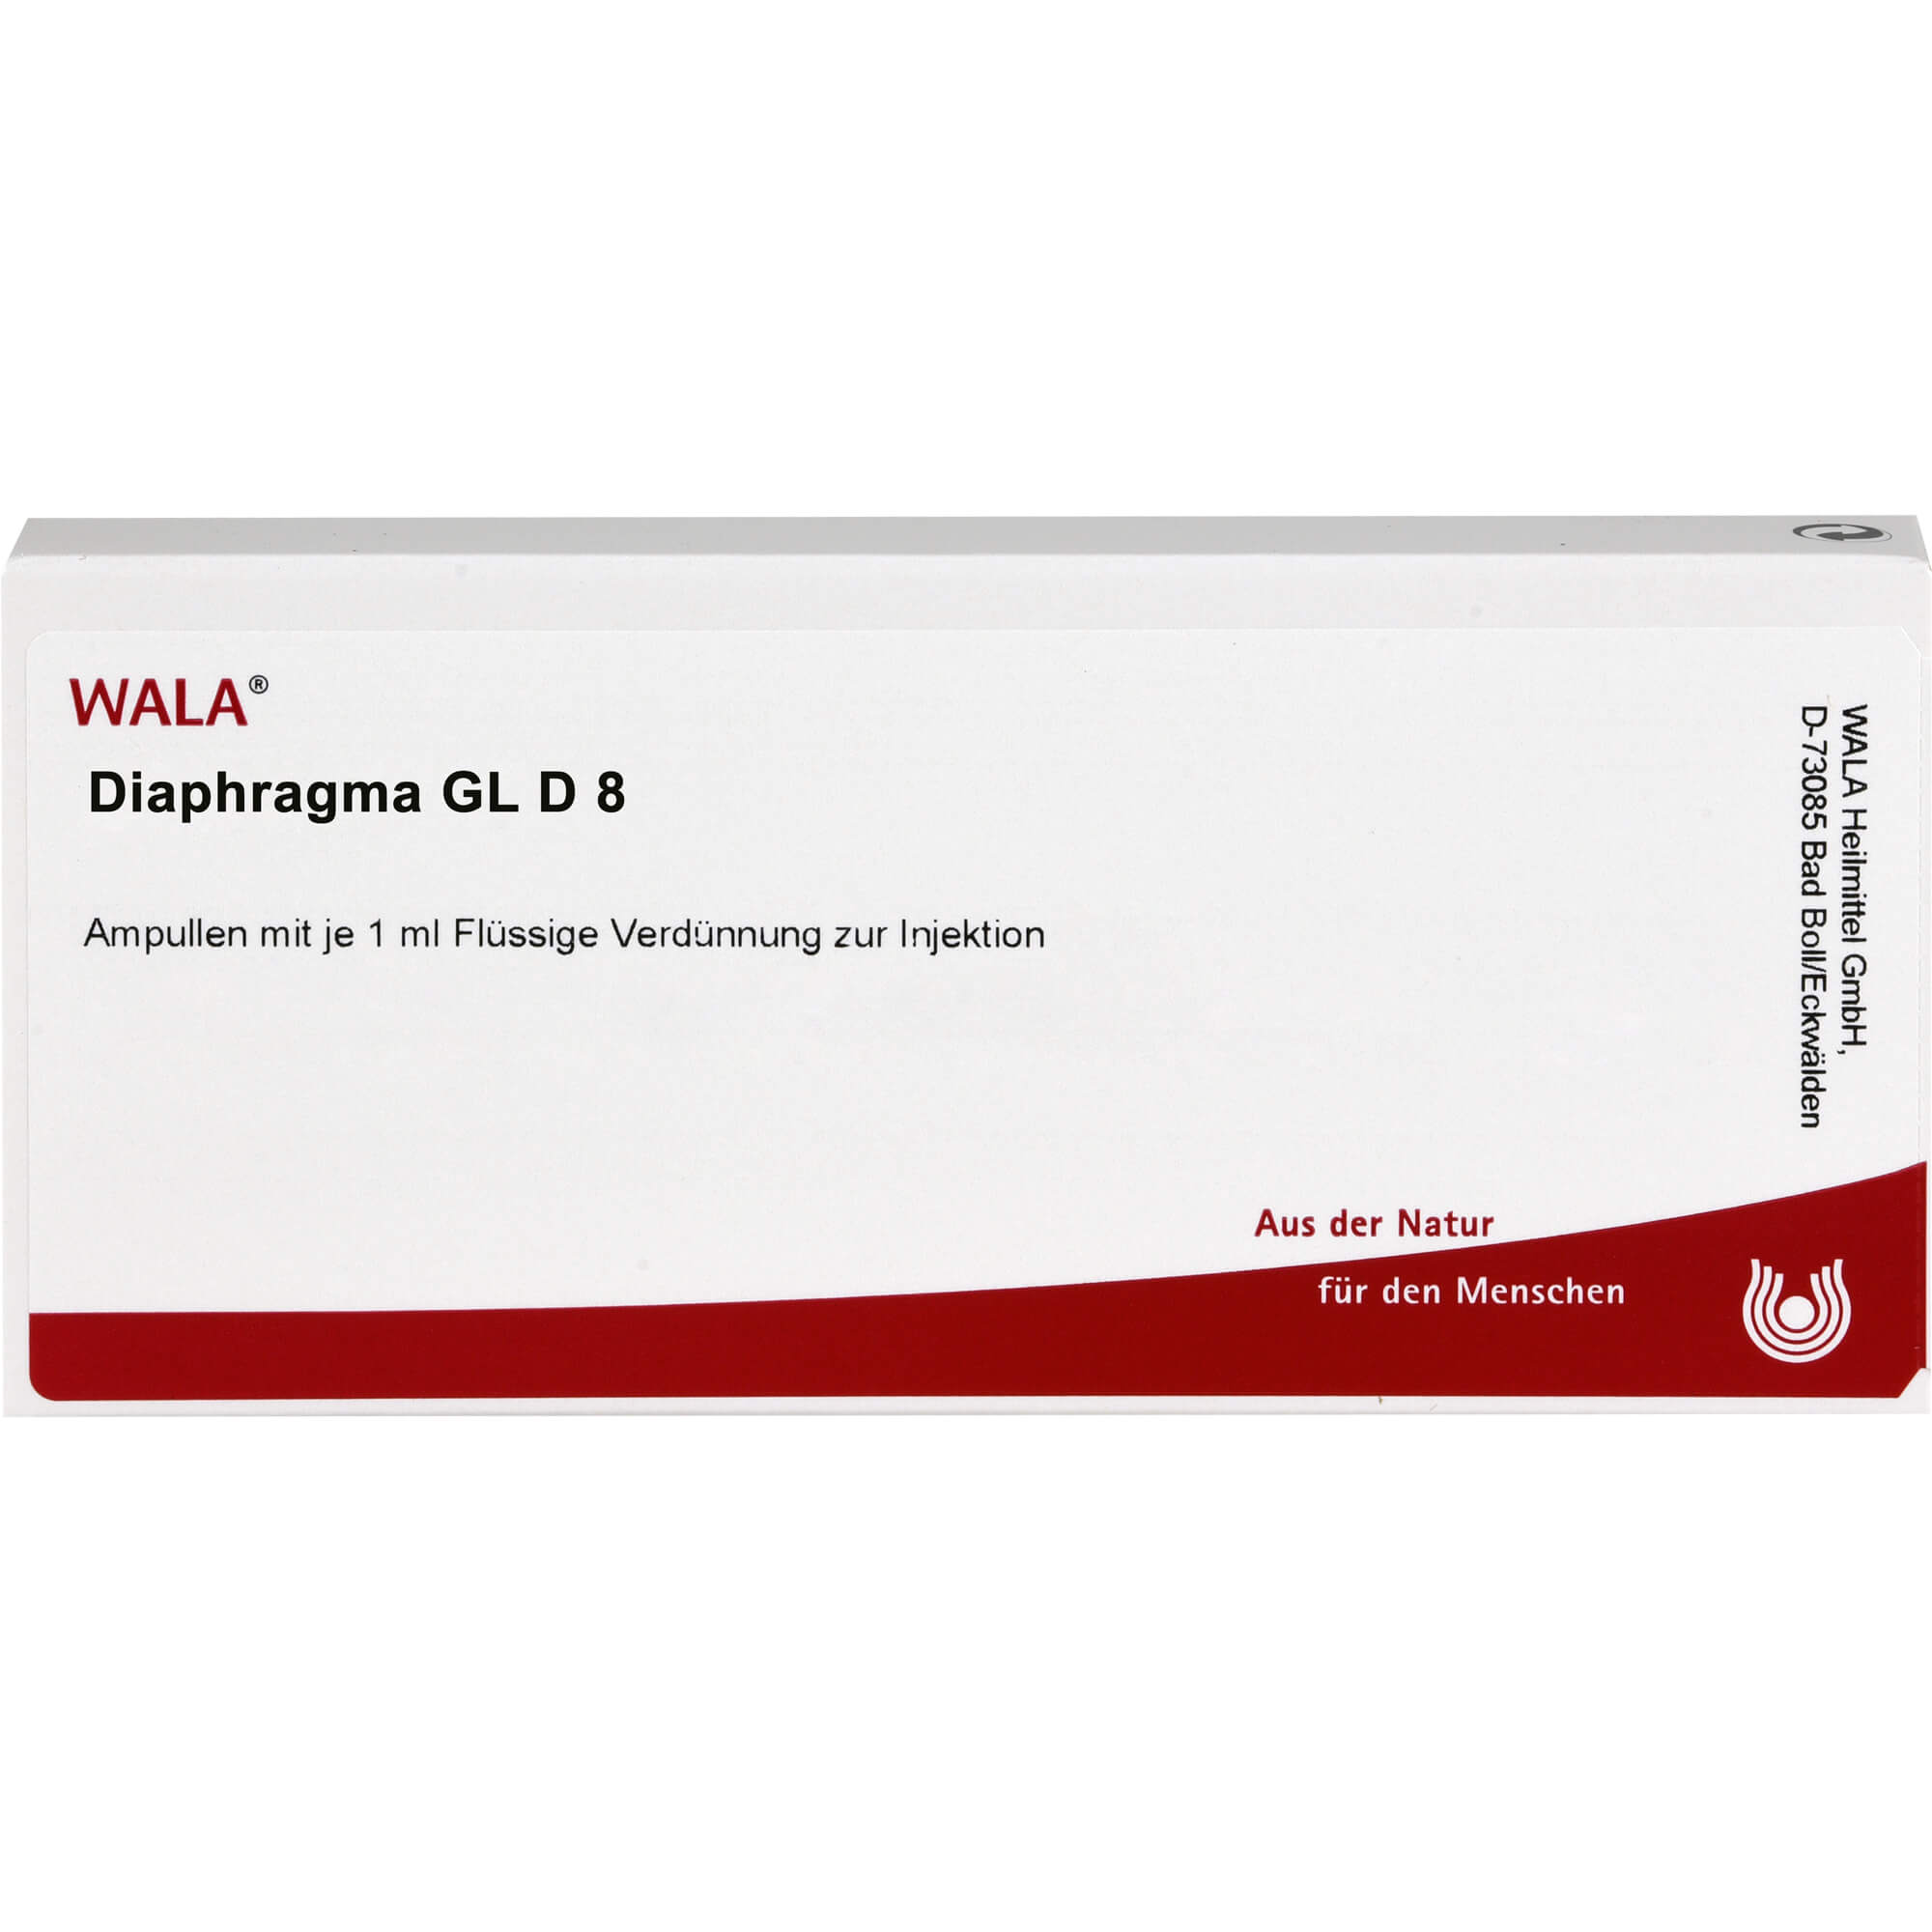 DIAPHRAGMA GL D 8 Ampullen